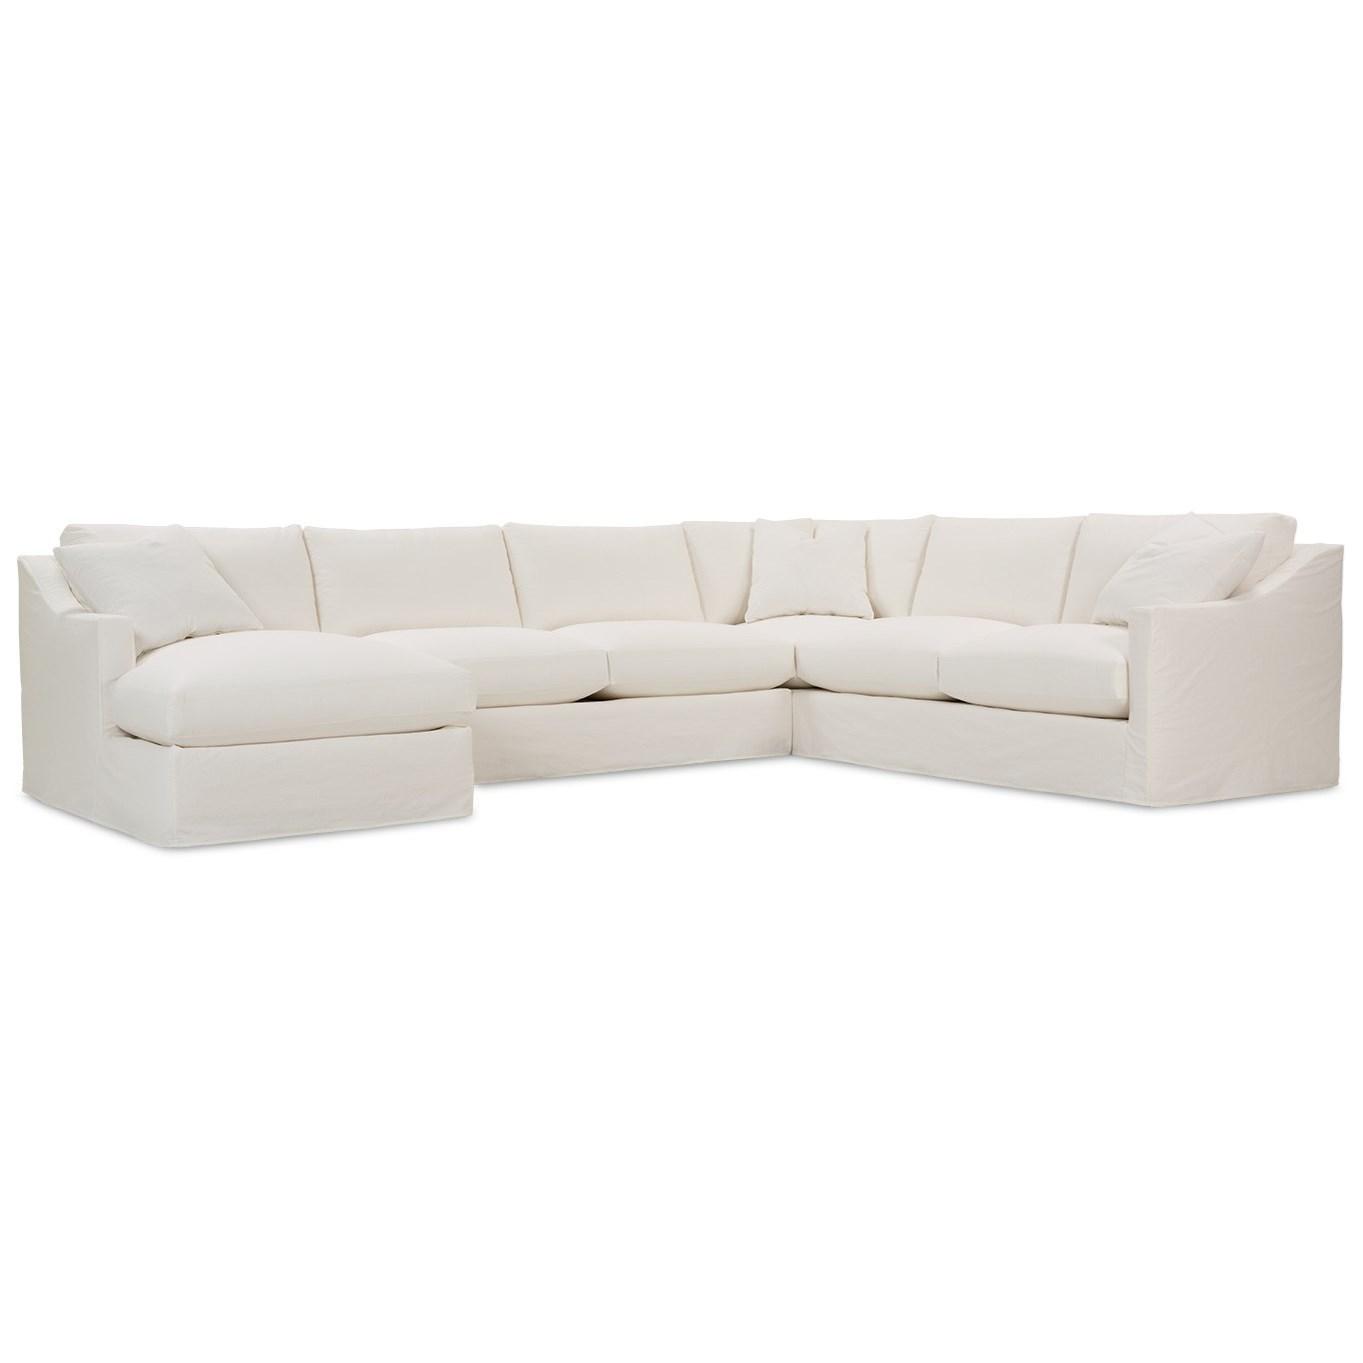 bradford transitional sectional sofa